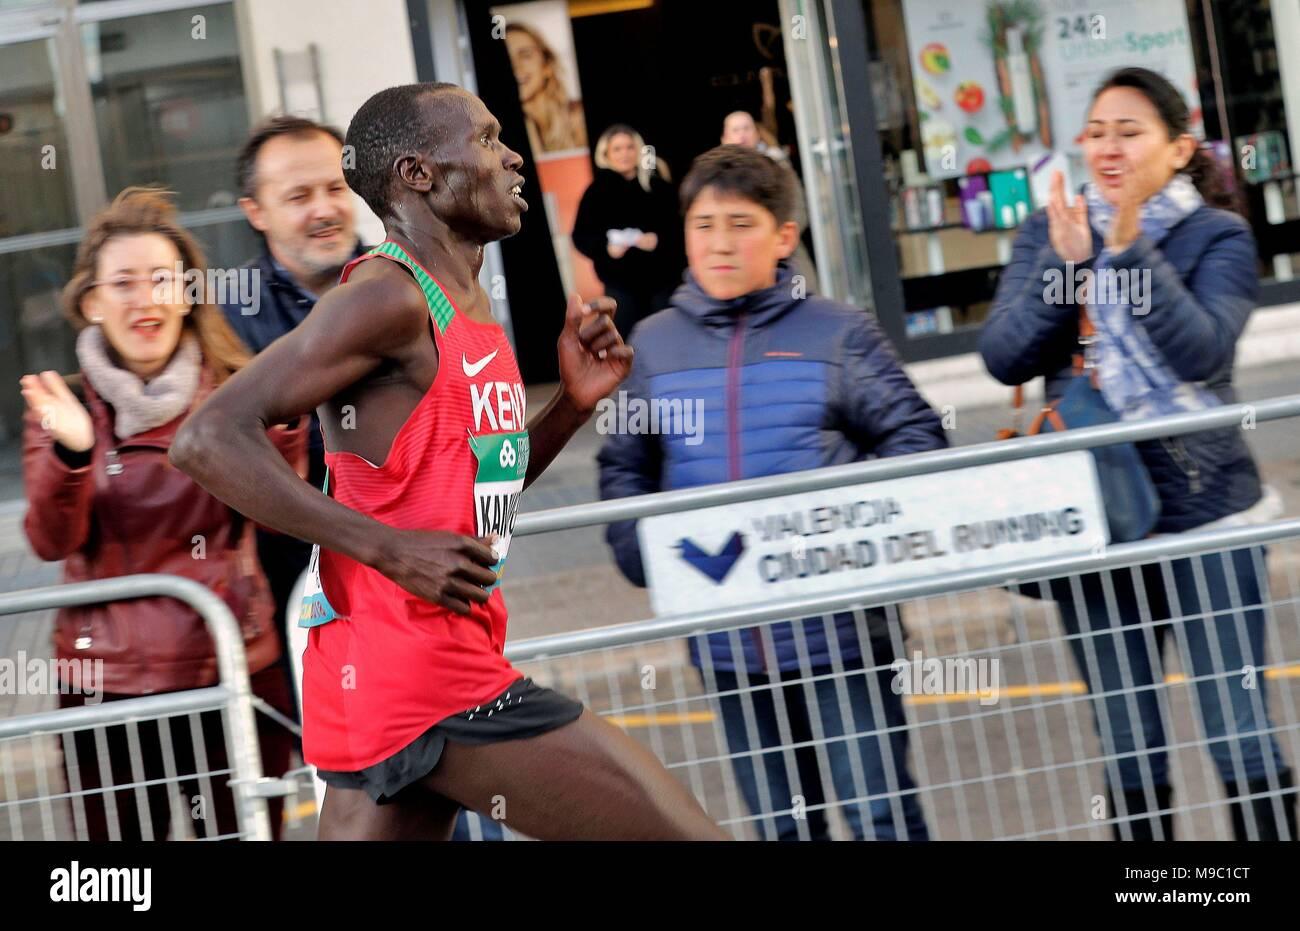 Kenyan athlete Geoffrey Kamworor in action during the International Association of Athletics Federations (IAAF) Men's World Half Marathon Championships 2018 in Valencia, eastern Spain, 24 March 2018. EFE/MANUEL BRUQUE - Stock Image